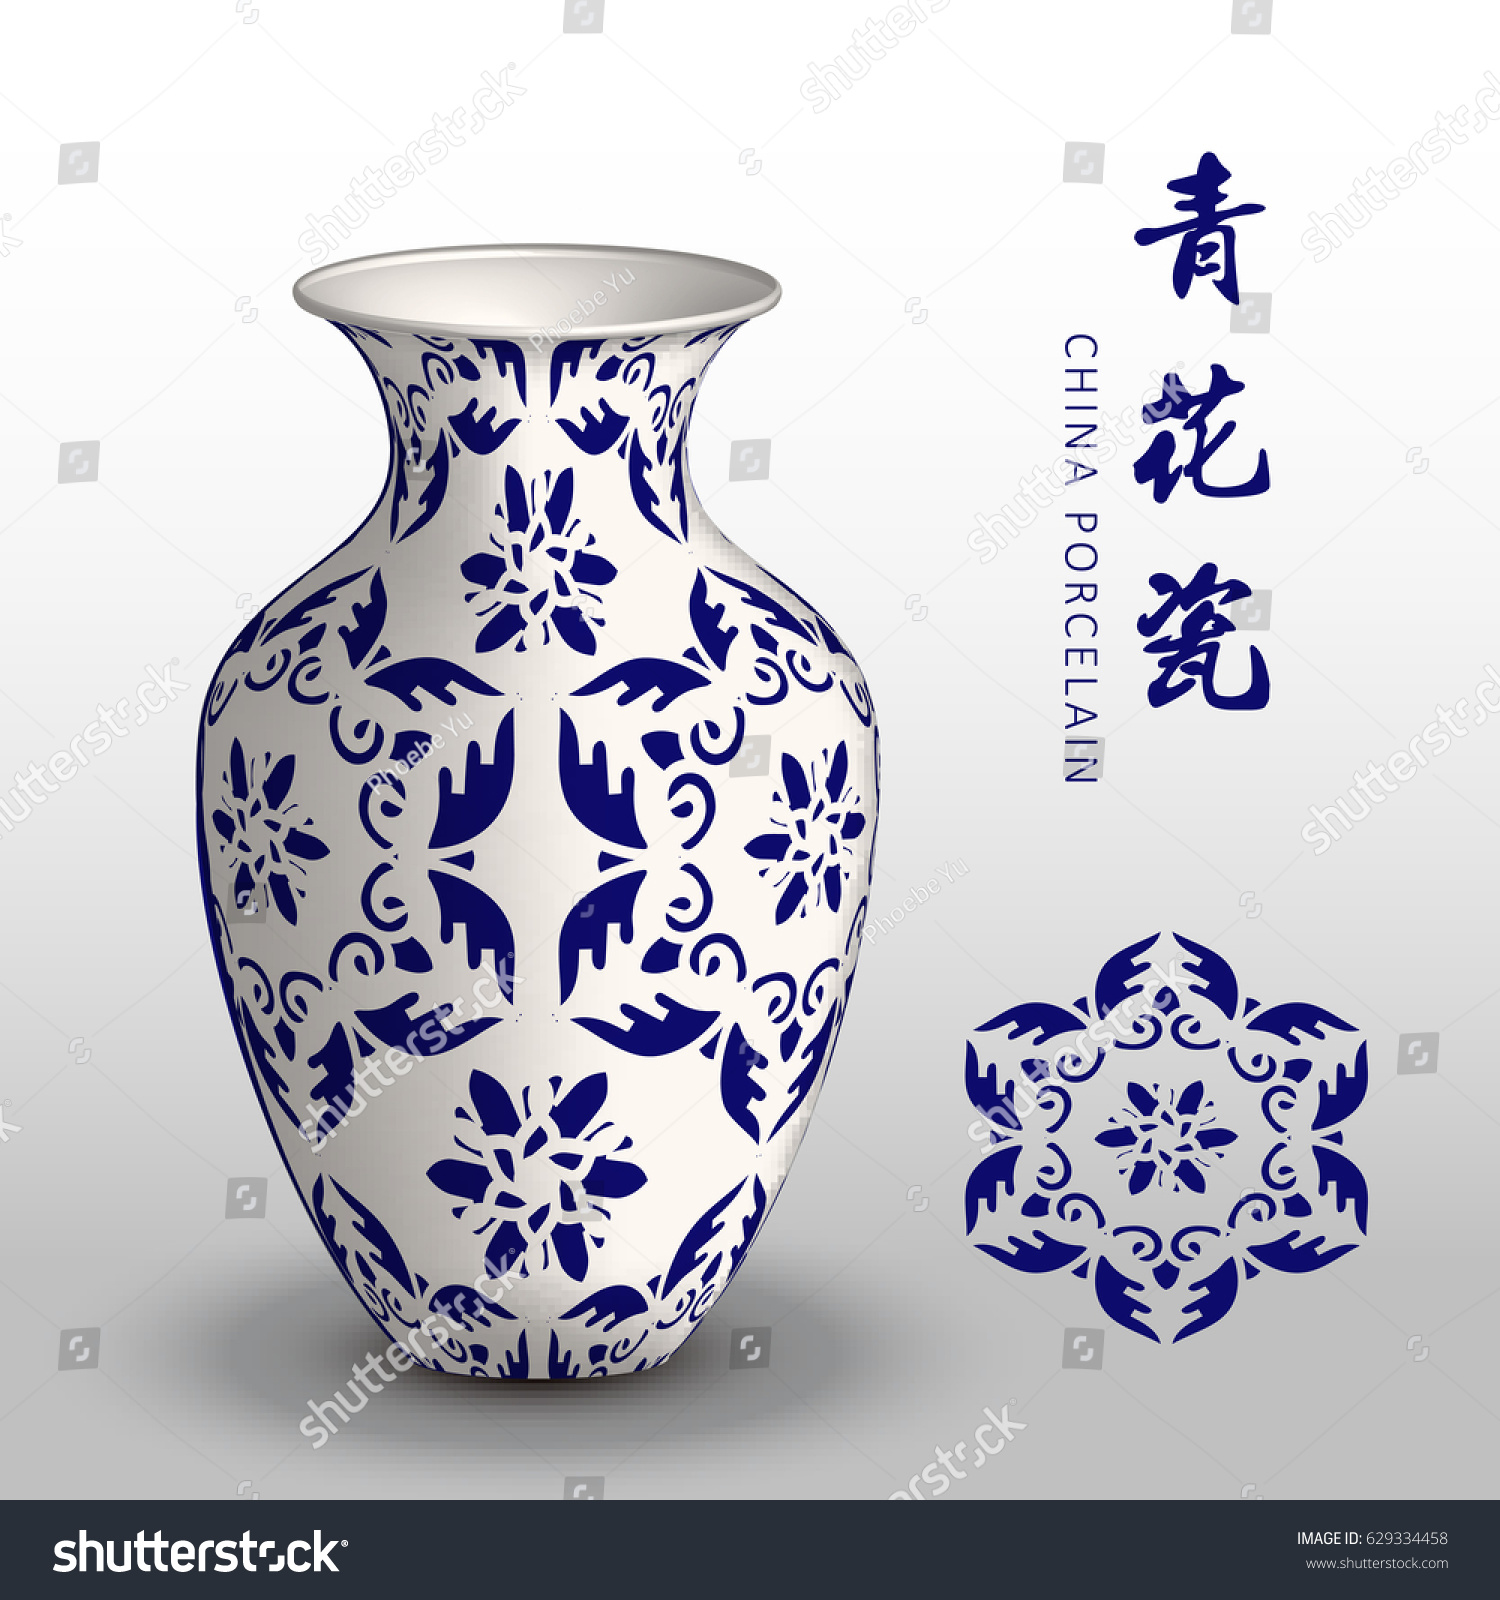 Navy blue China porcelain vase feather polygon spiral cross flower